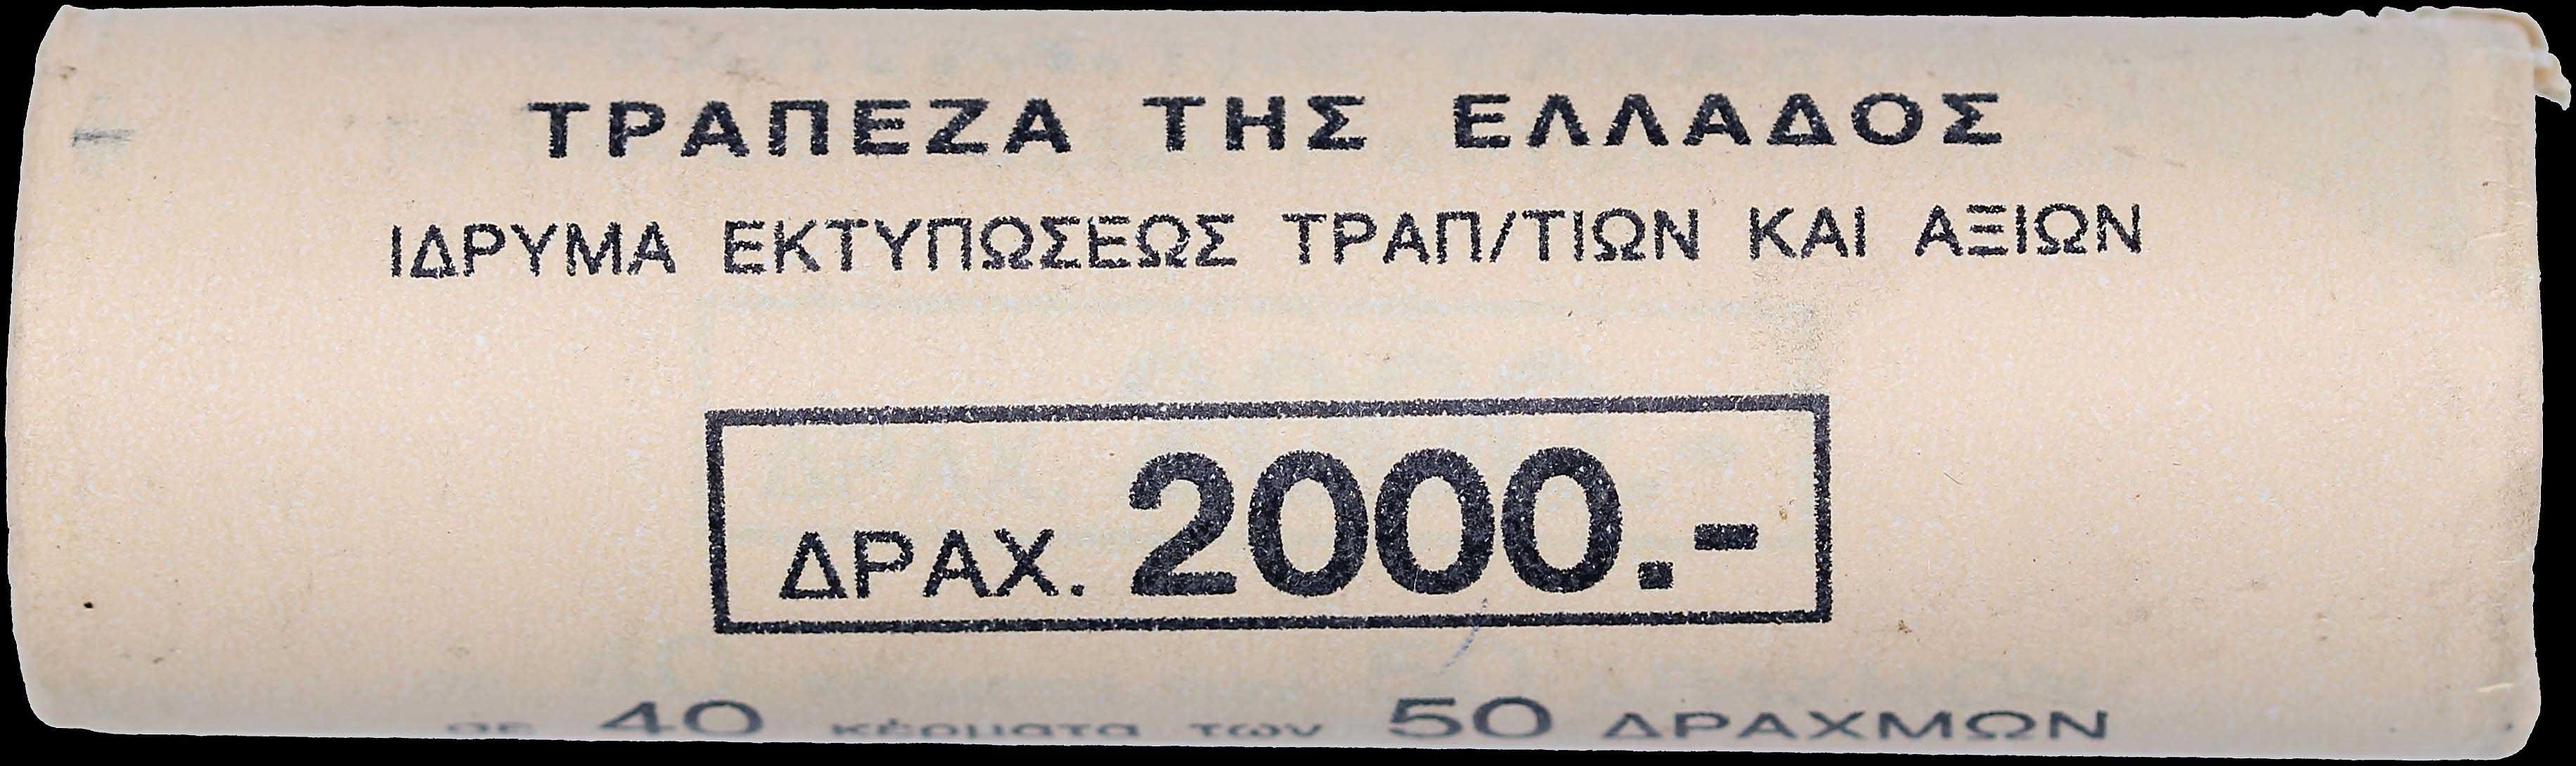 Lot 6239 - -  COINS & TOKENS HELLENIC REPUBLIC & COMMEMORATIVE ISSUES -  A. Karamitsos Public & Live Internet Auction 682 (Part A) Coins, Medals & Banknotes